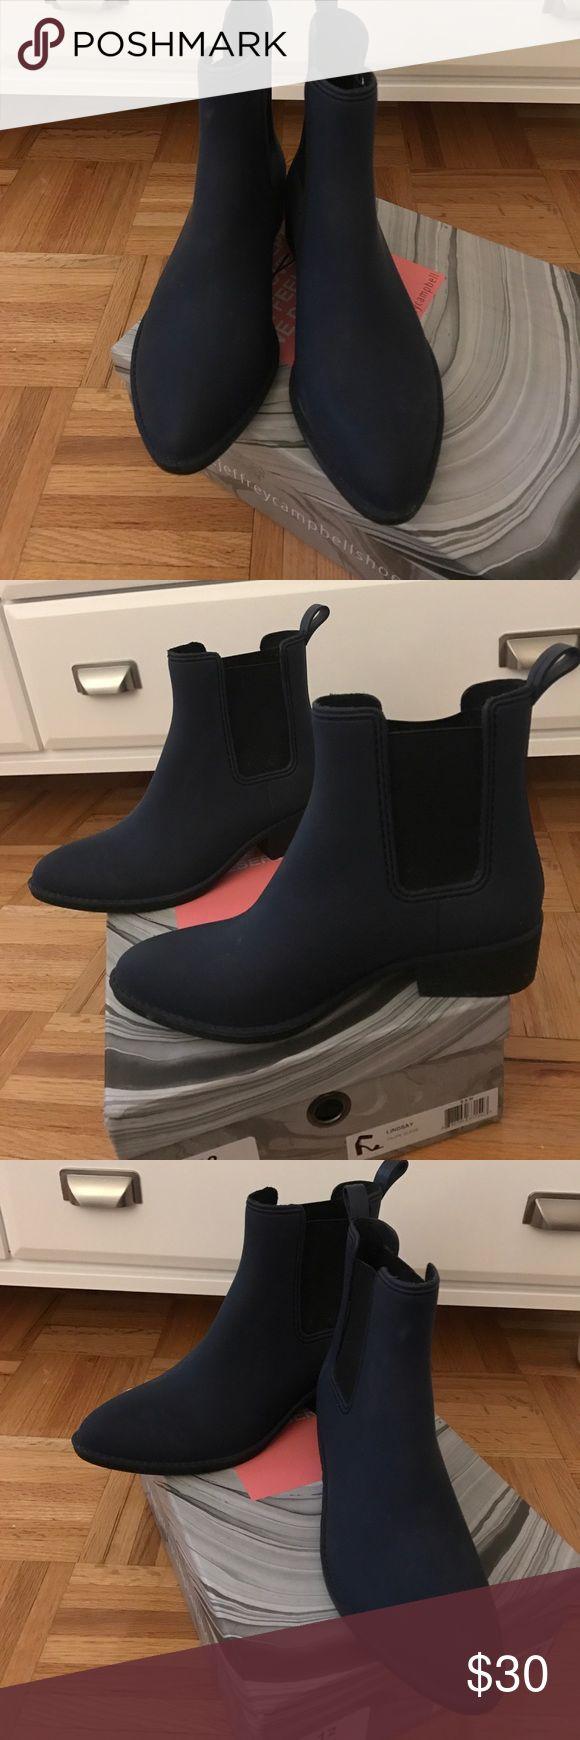 Jeffrey Campbell Navy rubber rain boots Jeffrey Campbell rubber rain boots. Navy and easily wipeable. Jeffrey Campbell Shoes Winter & Rain Boots